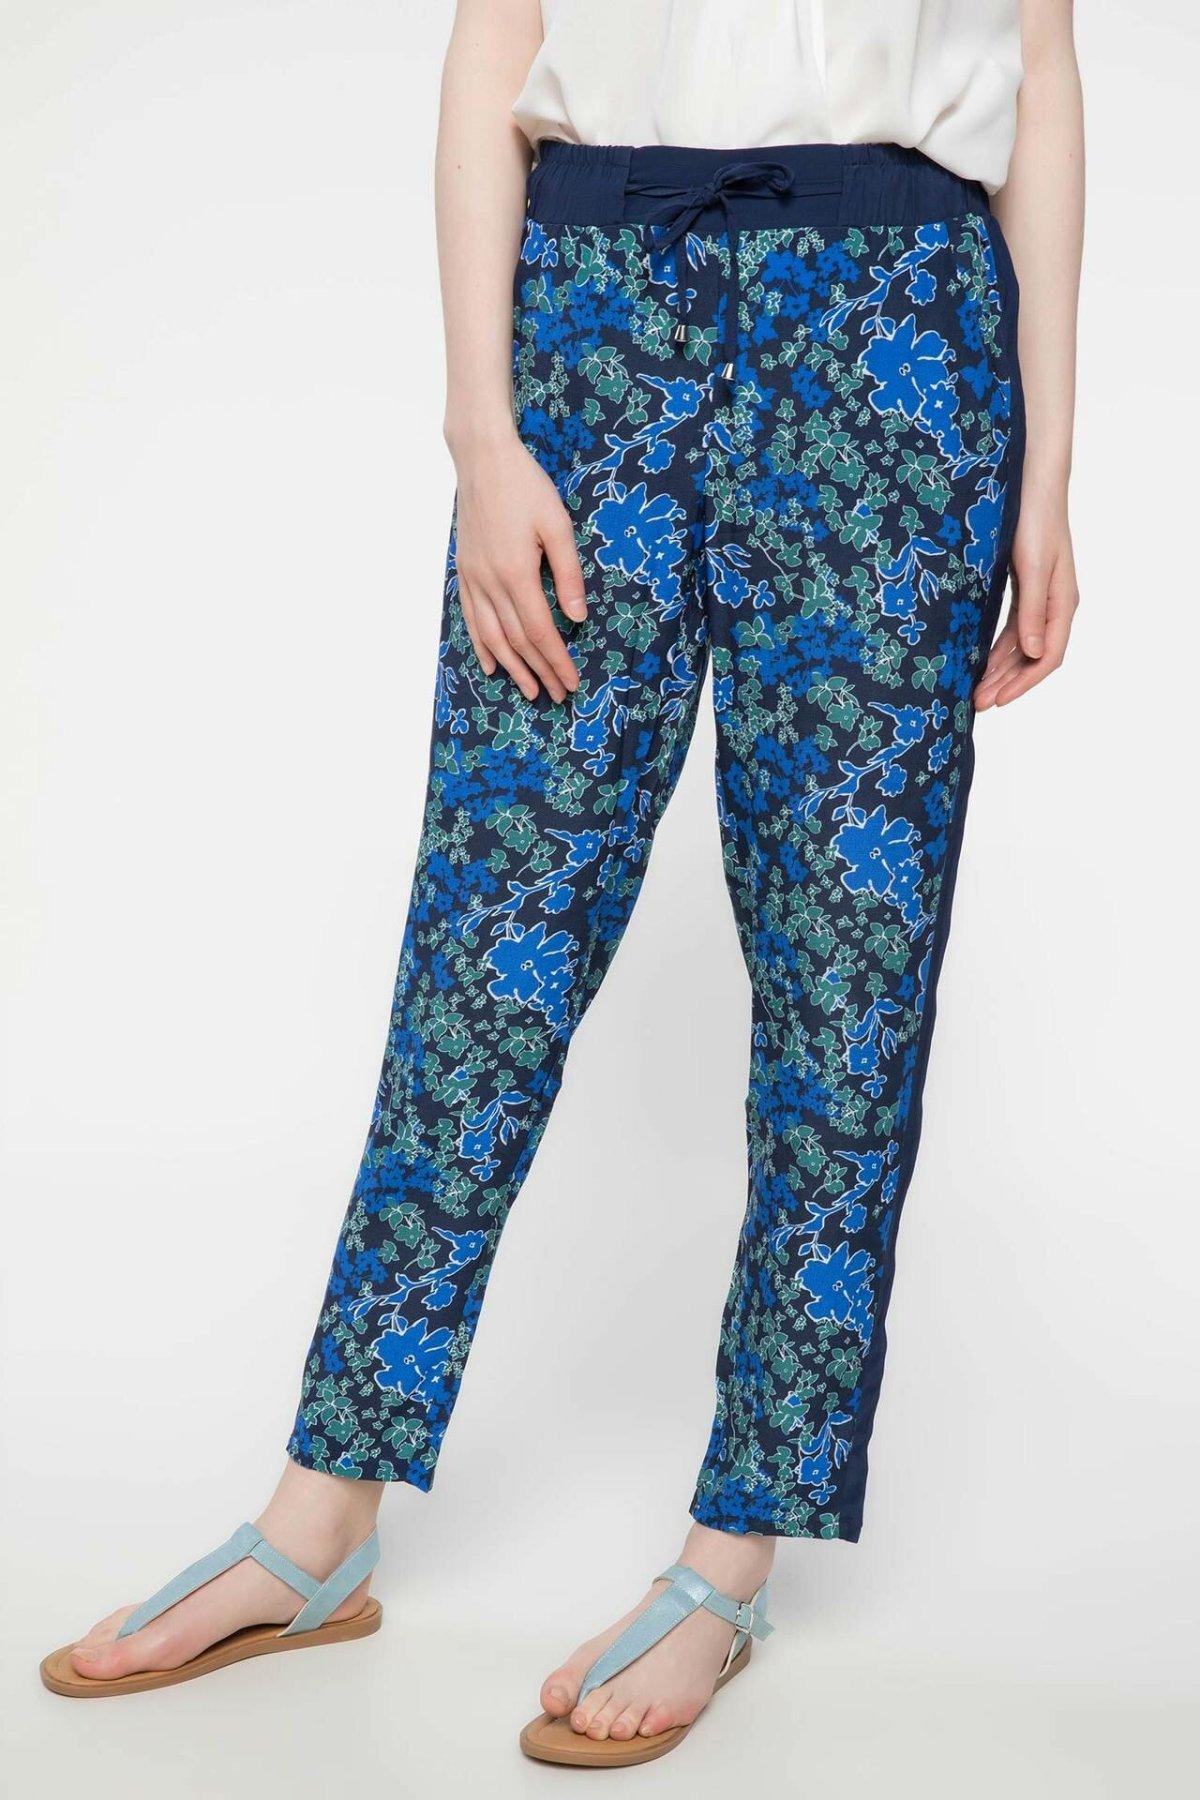 DeFacto Fashion Woman Long Trousers Female Casual Flowers Pattern Ladies Loose Straight Pants Comfort - J1721AZ18SM